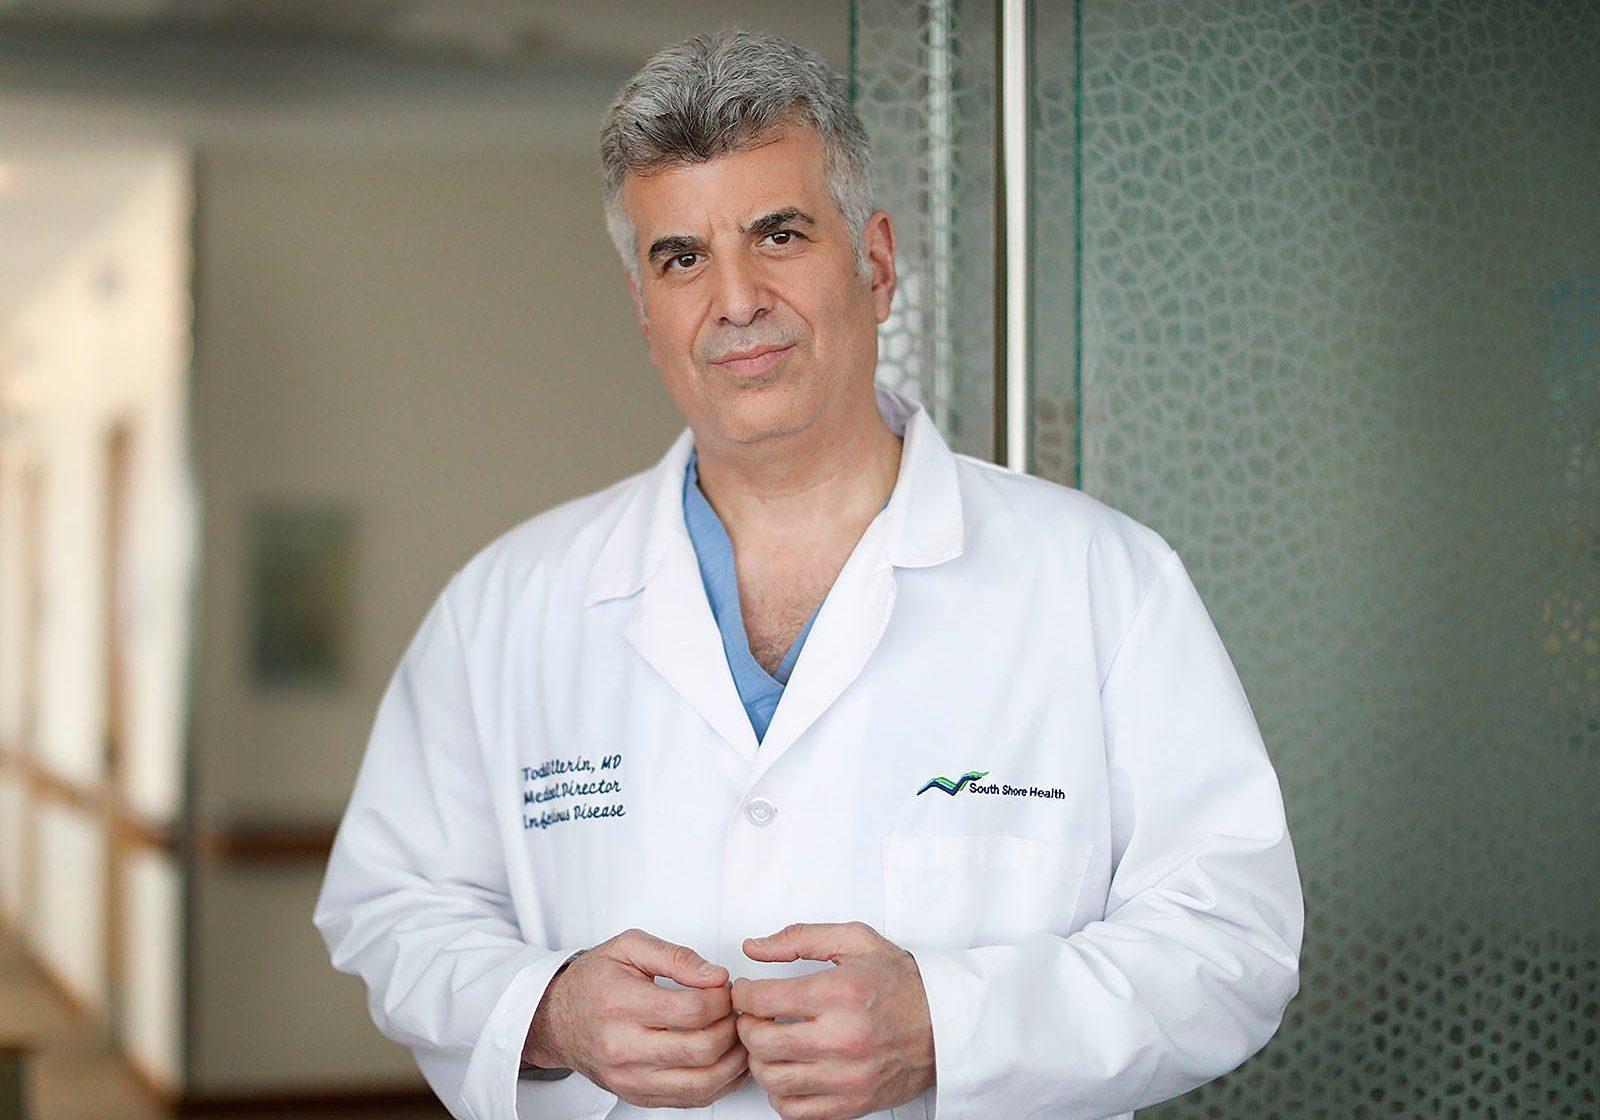 Todd Ellerin, MD. Photo courtesy of South Shore Health.